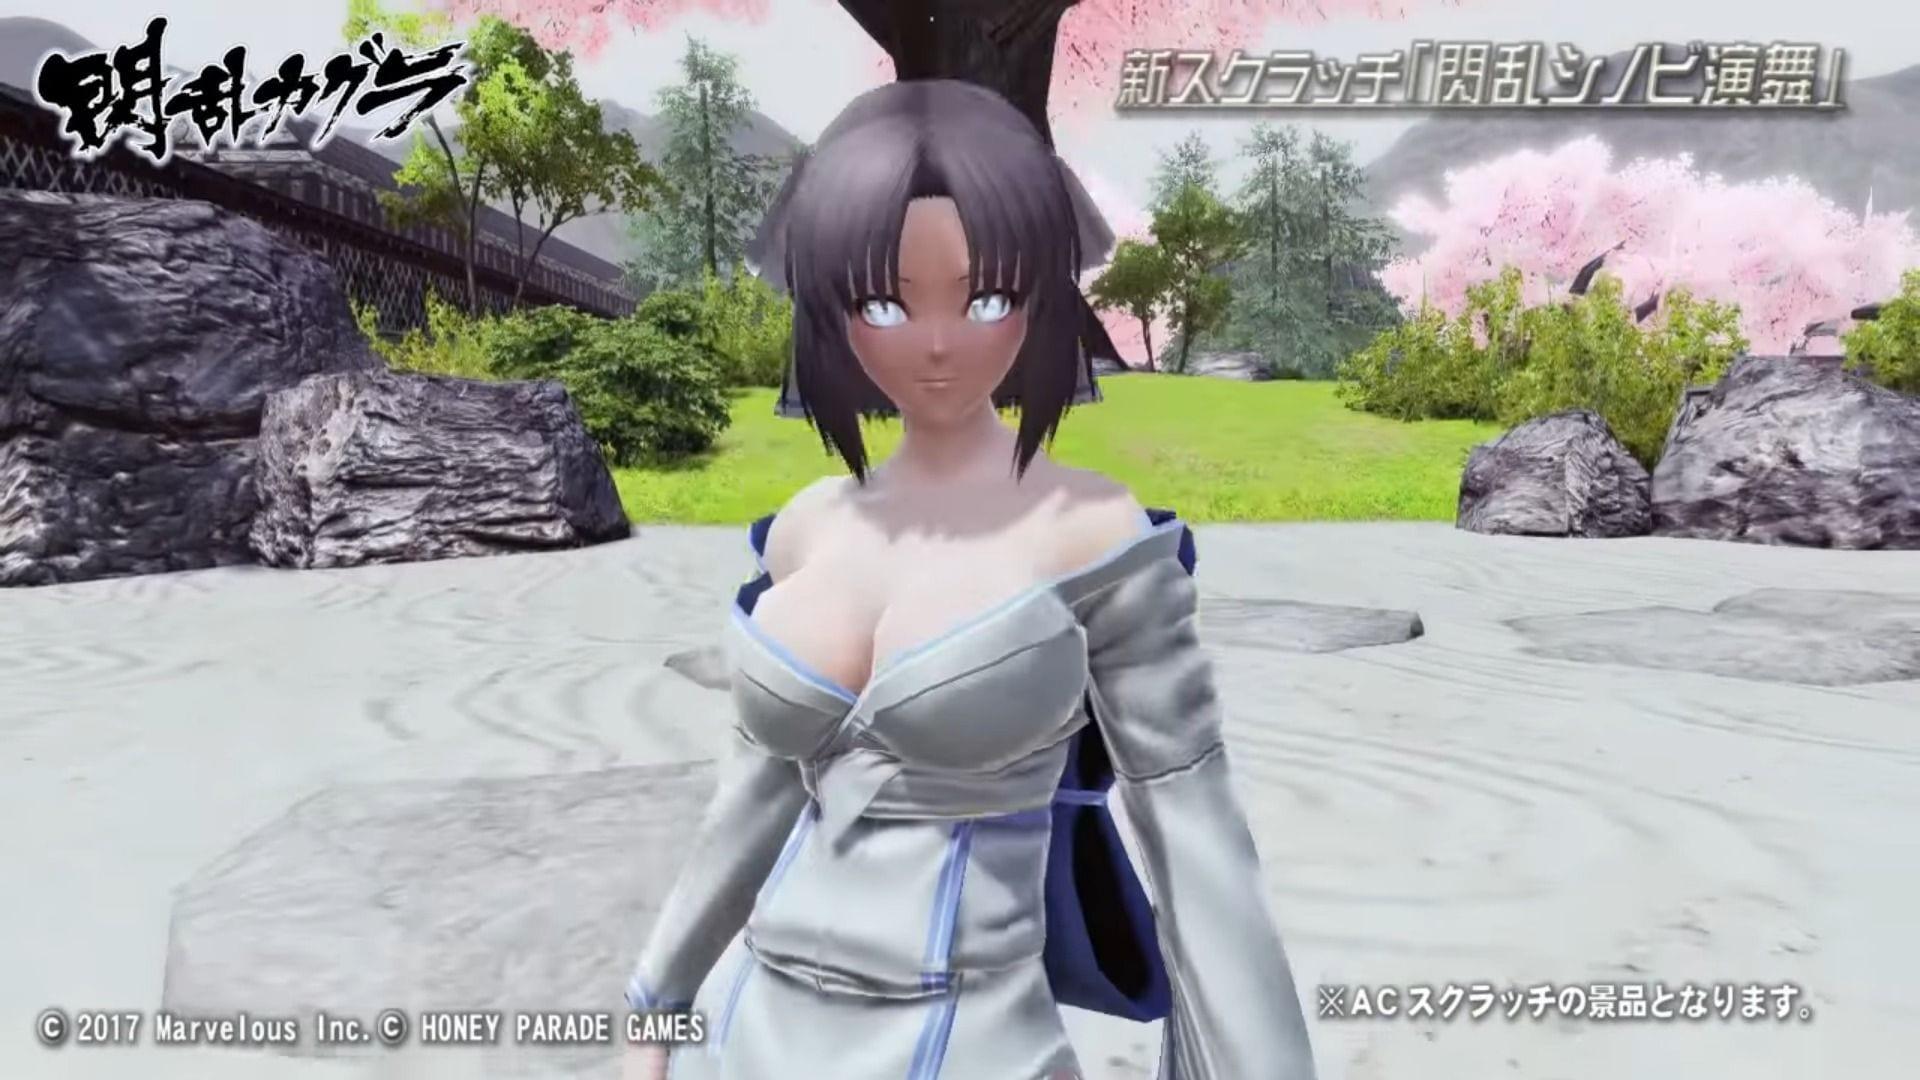 Phantasy Star On-line 2 Will get New Trailer Displaying Senran Kagura Crossover Costumes & Extra 1